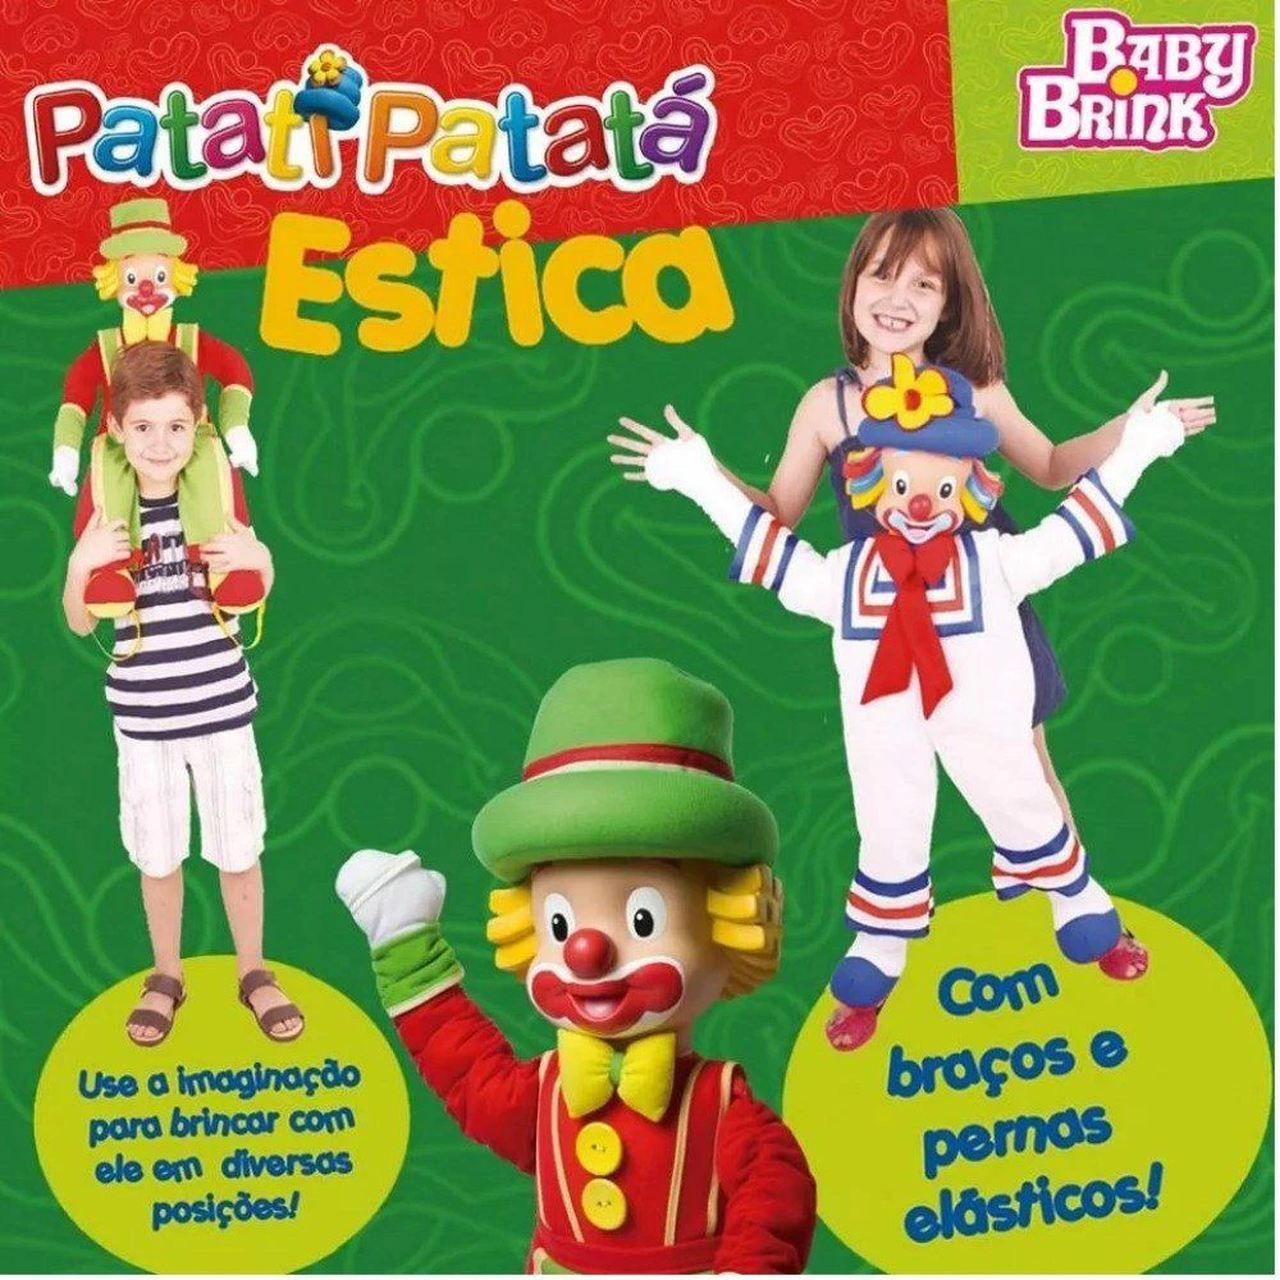 Boneco De Pano Patati Patatá 60cm Patatá Estica - Baby Brink